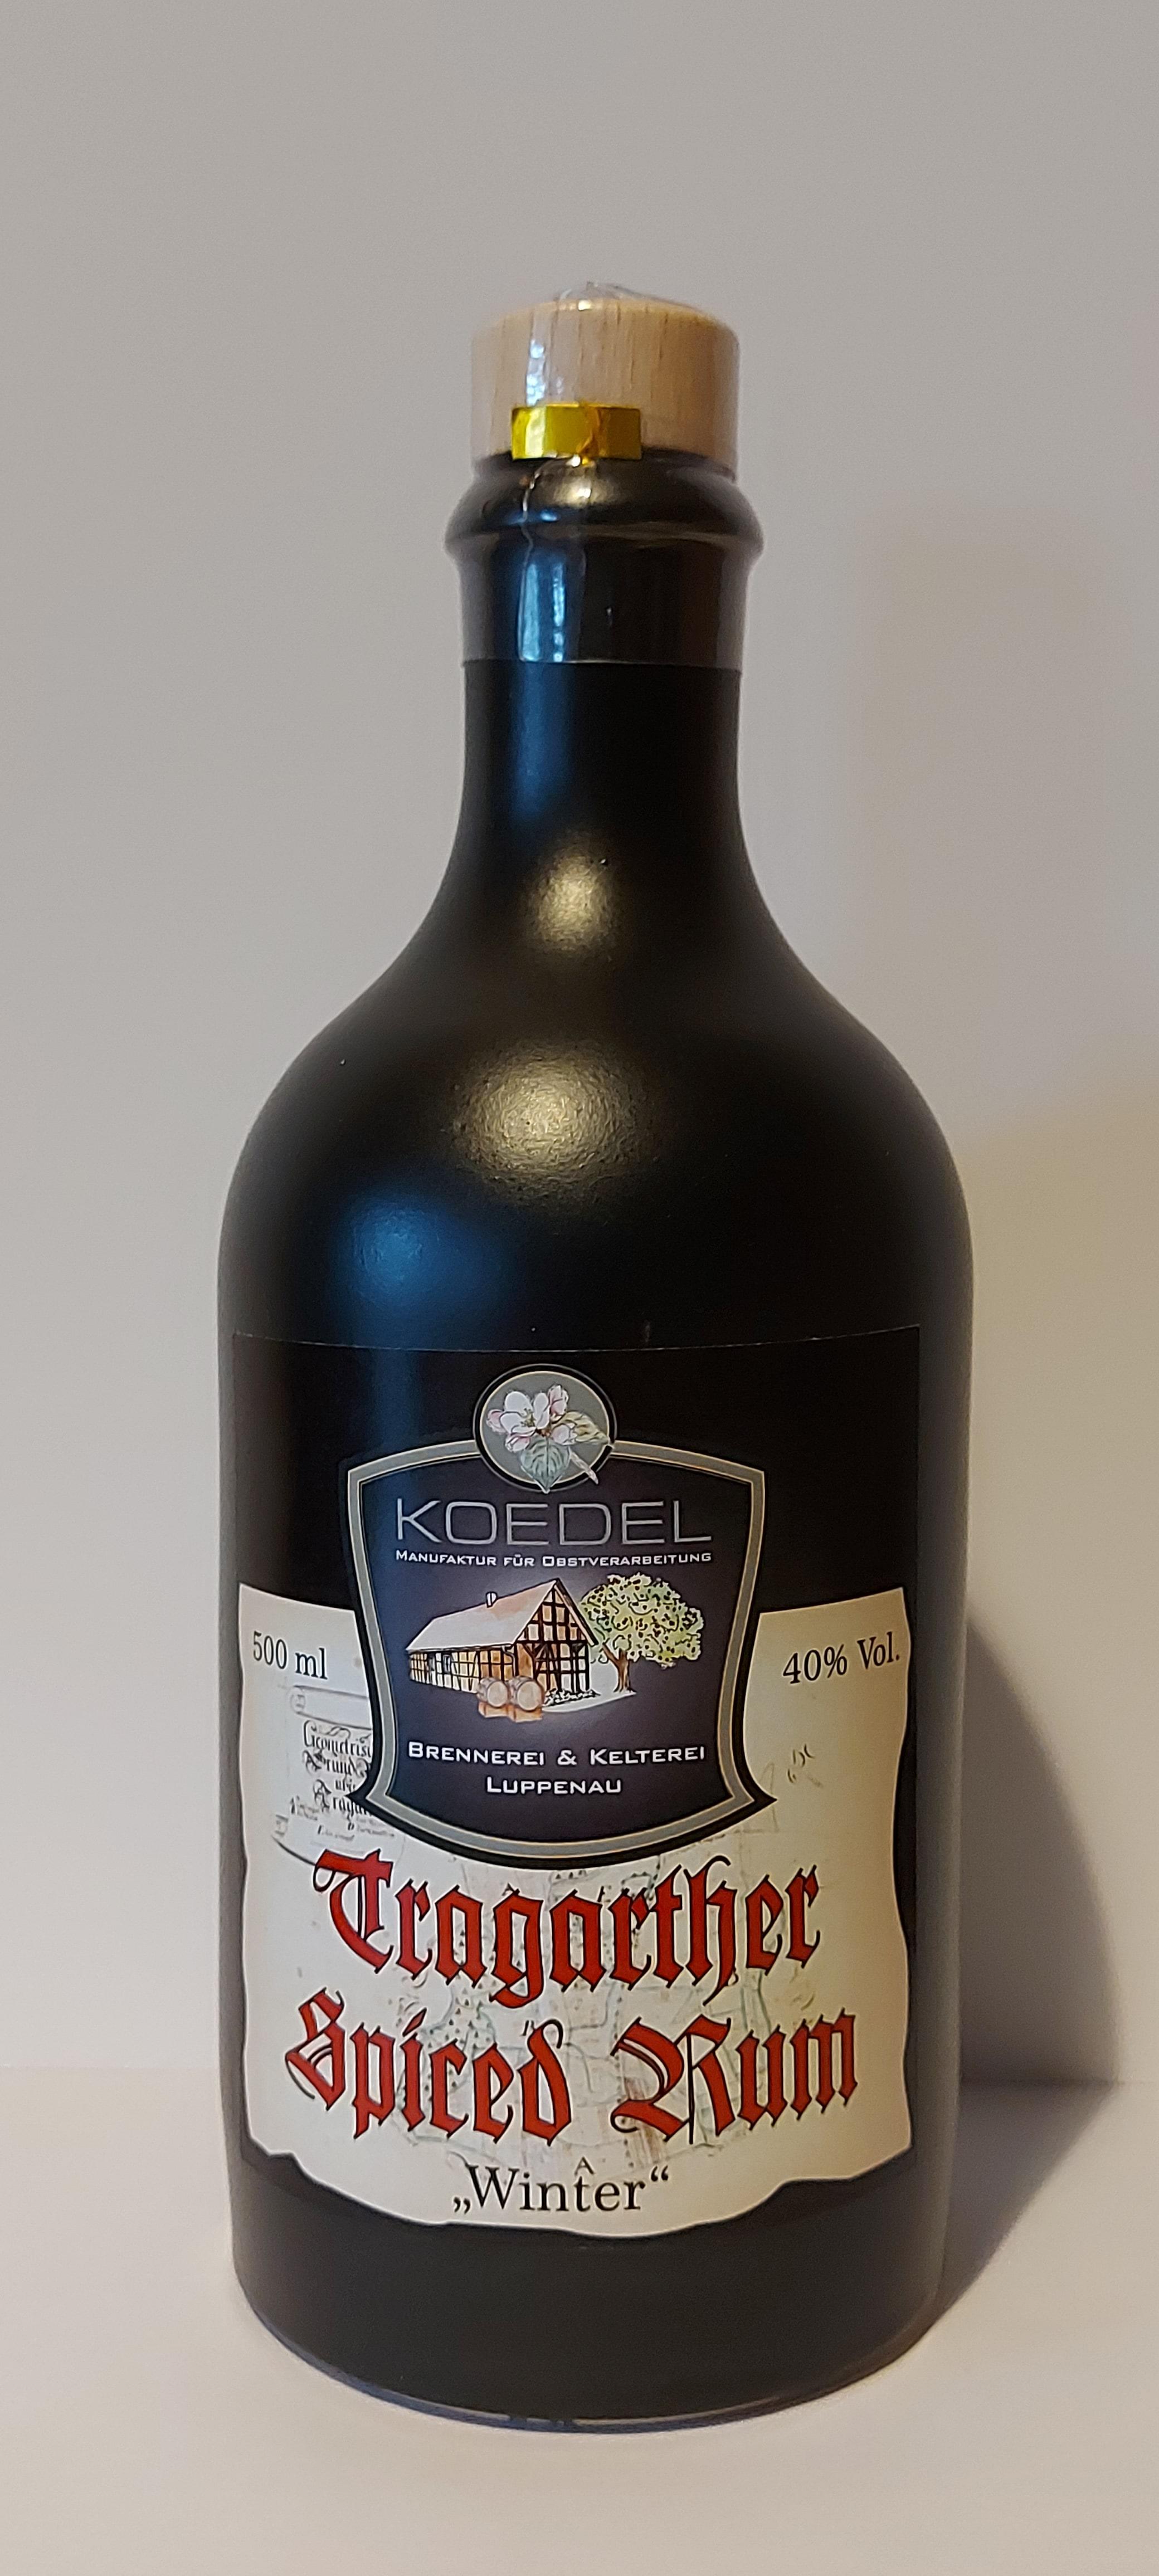 Tragrther Rum, Spiced Rum, Winter 500 ml